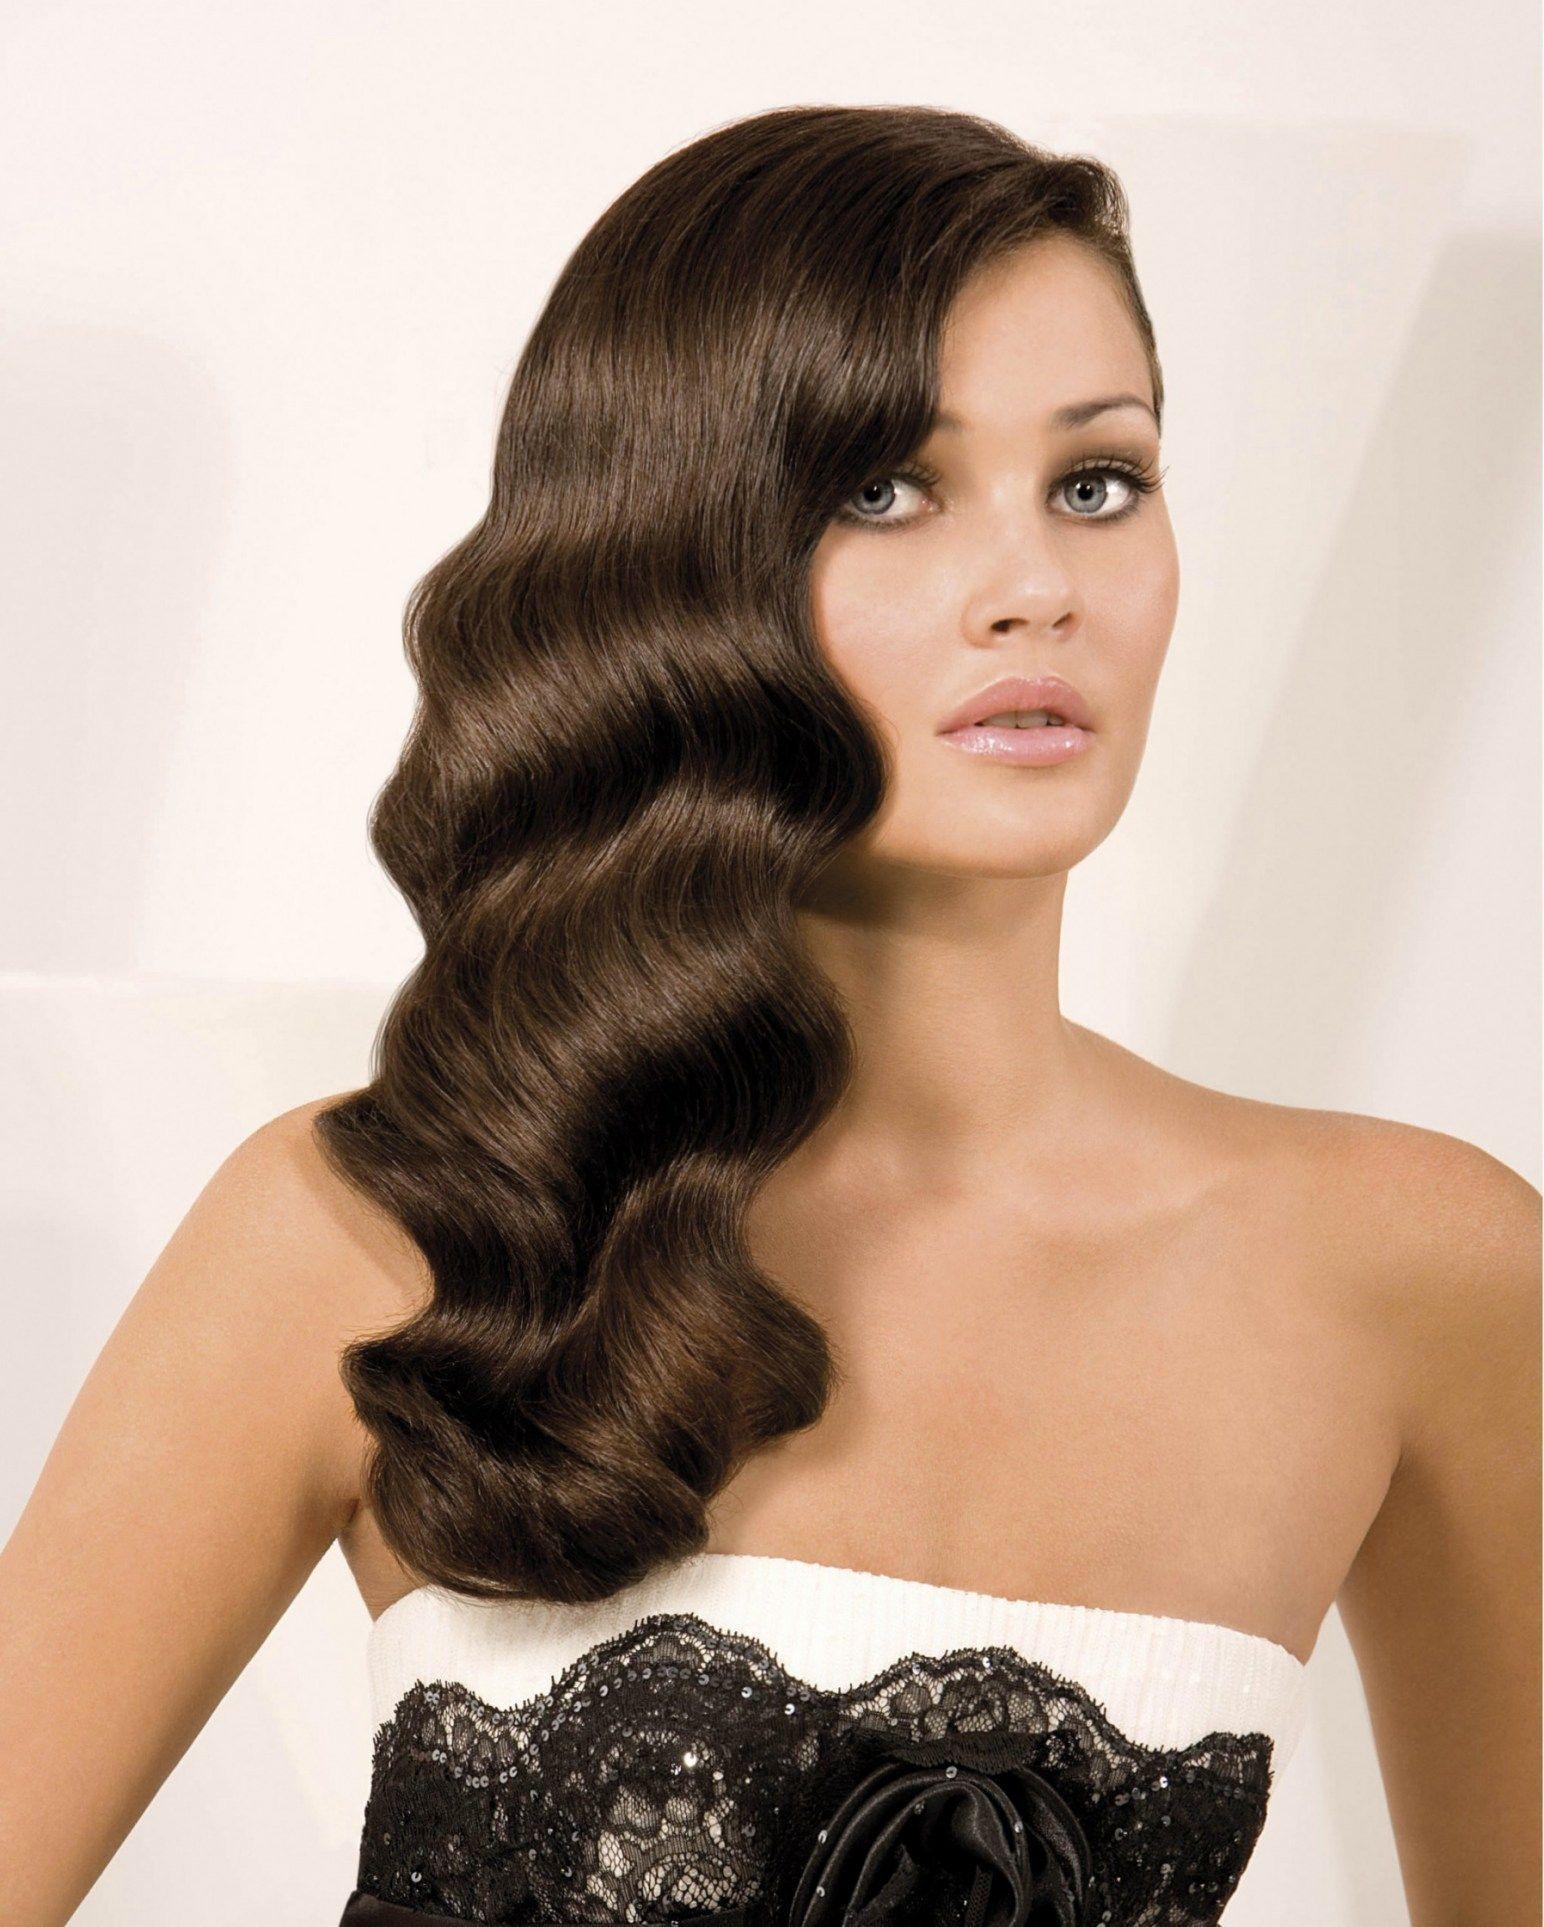 1920s Hairstyles For Long Hair How To Soft 1920slonghair 1920s Hairstyles For Long Hair How To Soft 1920 In 2020 20er Jahre Frisur Kurzhaarfrisuren Haarschnitt Kurz